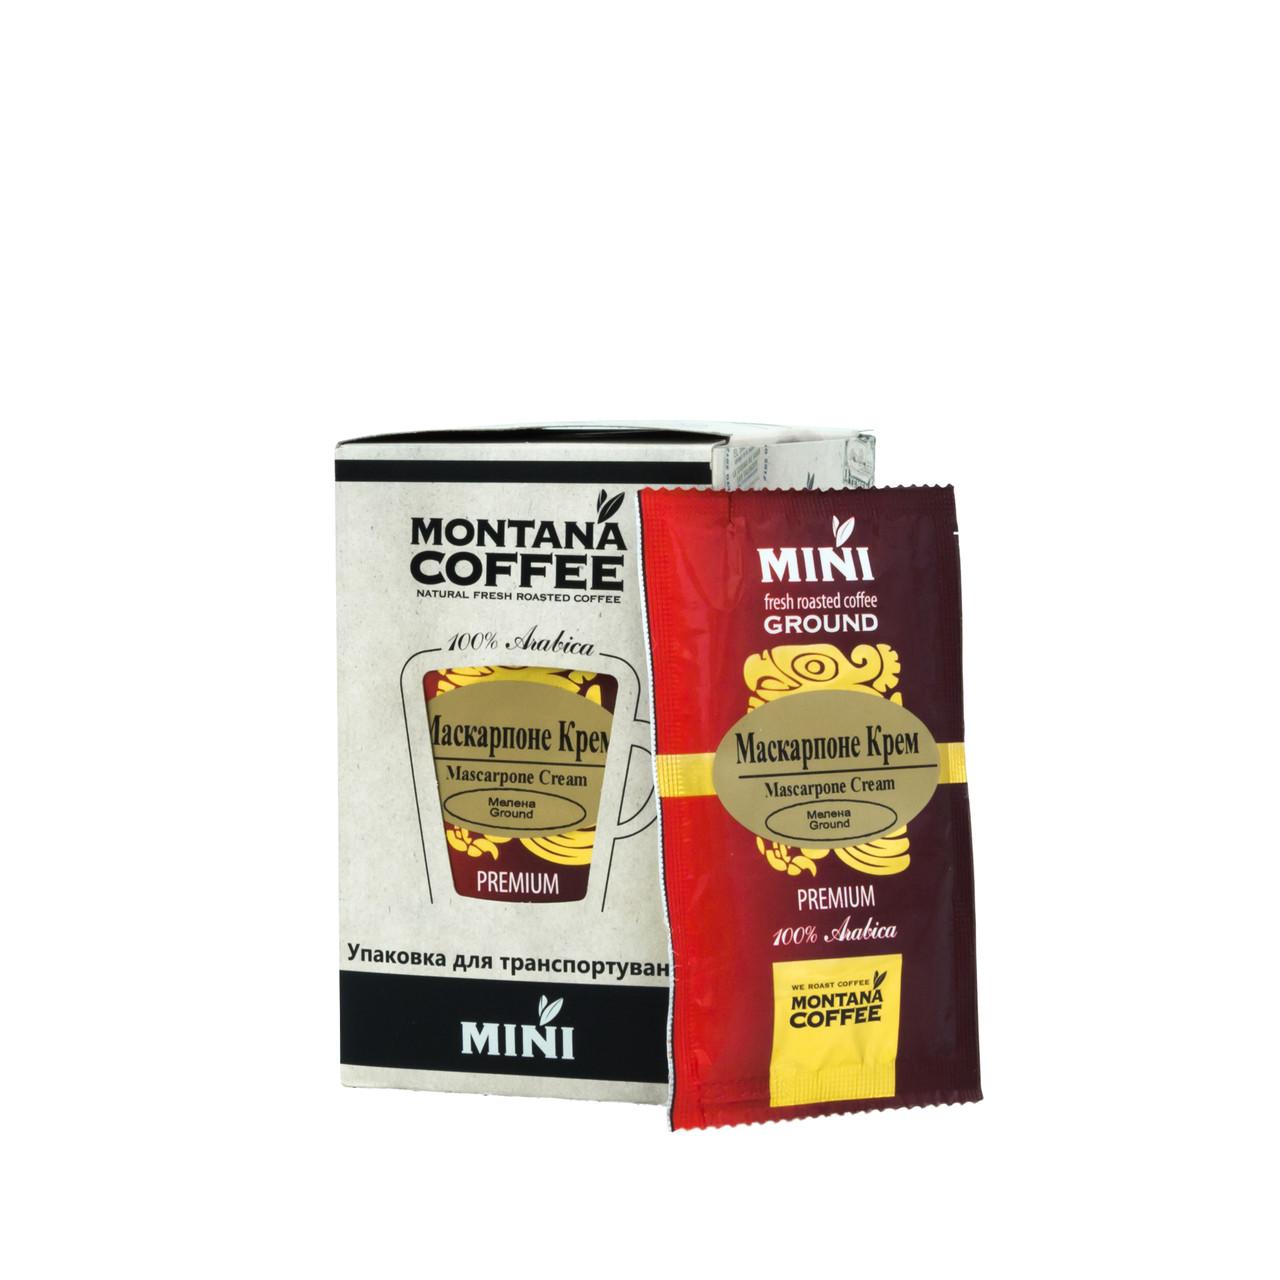 Маскарпоне крем Montana coffee MINI 20 шт